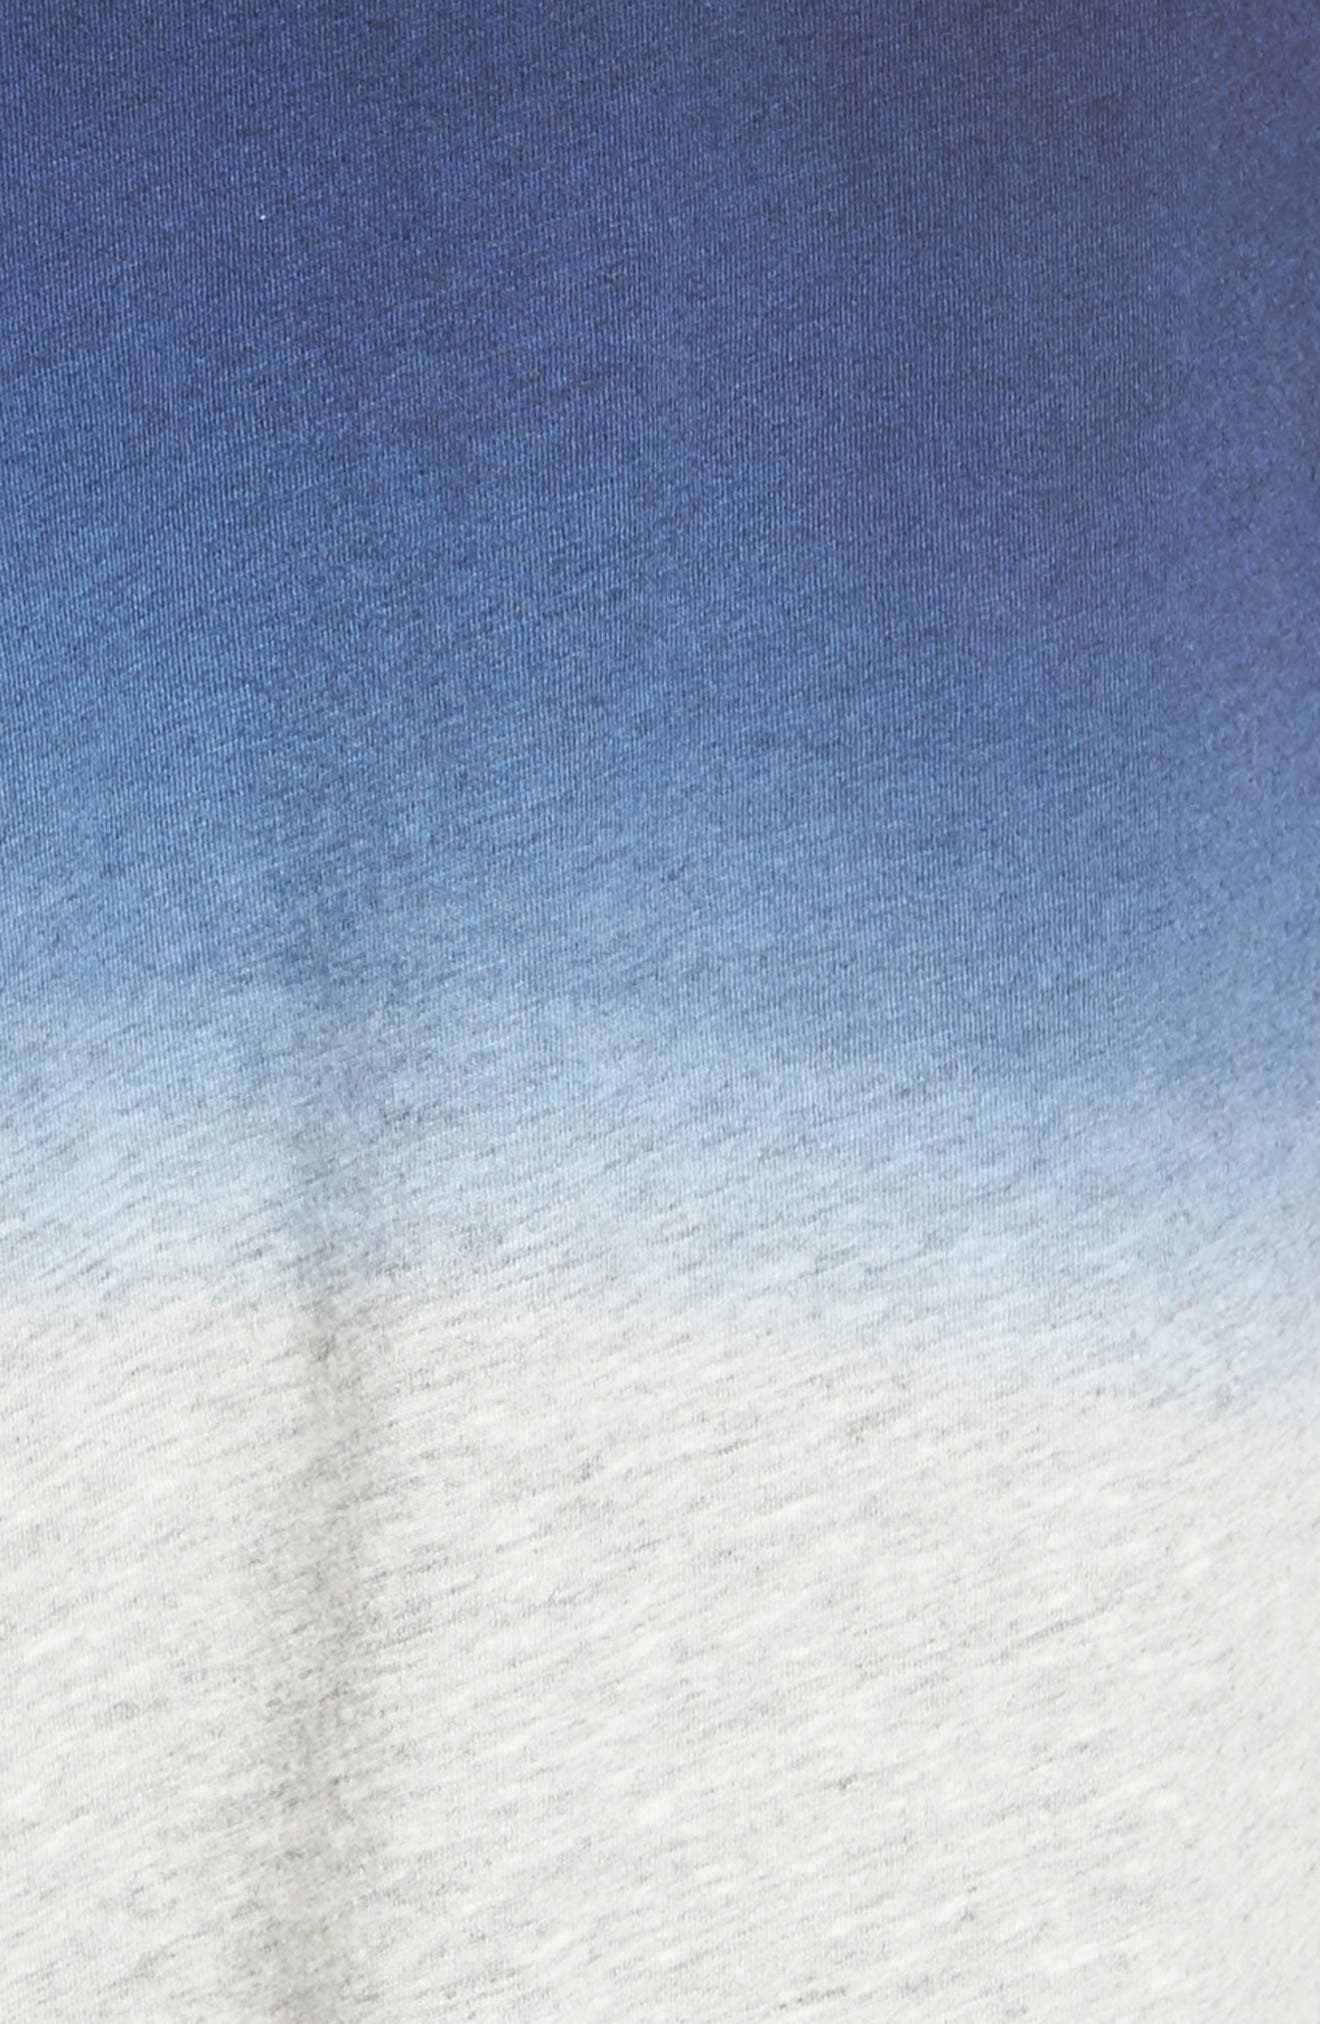 Dip Dye Lounge Shorts,                             Alternate thumbnail 5, color,                             Navy